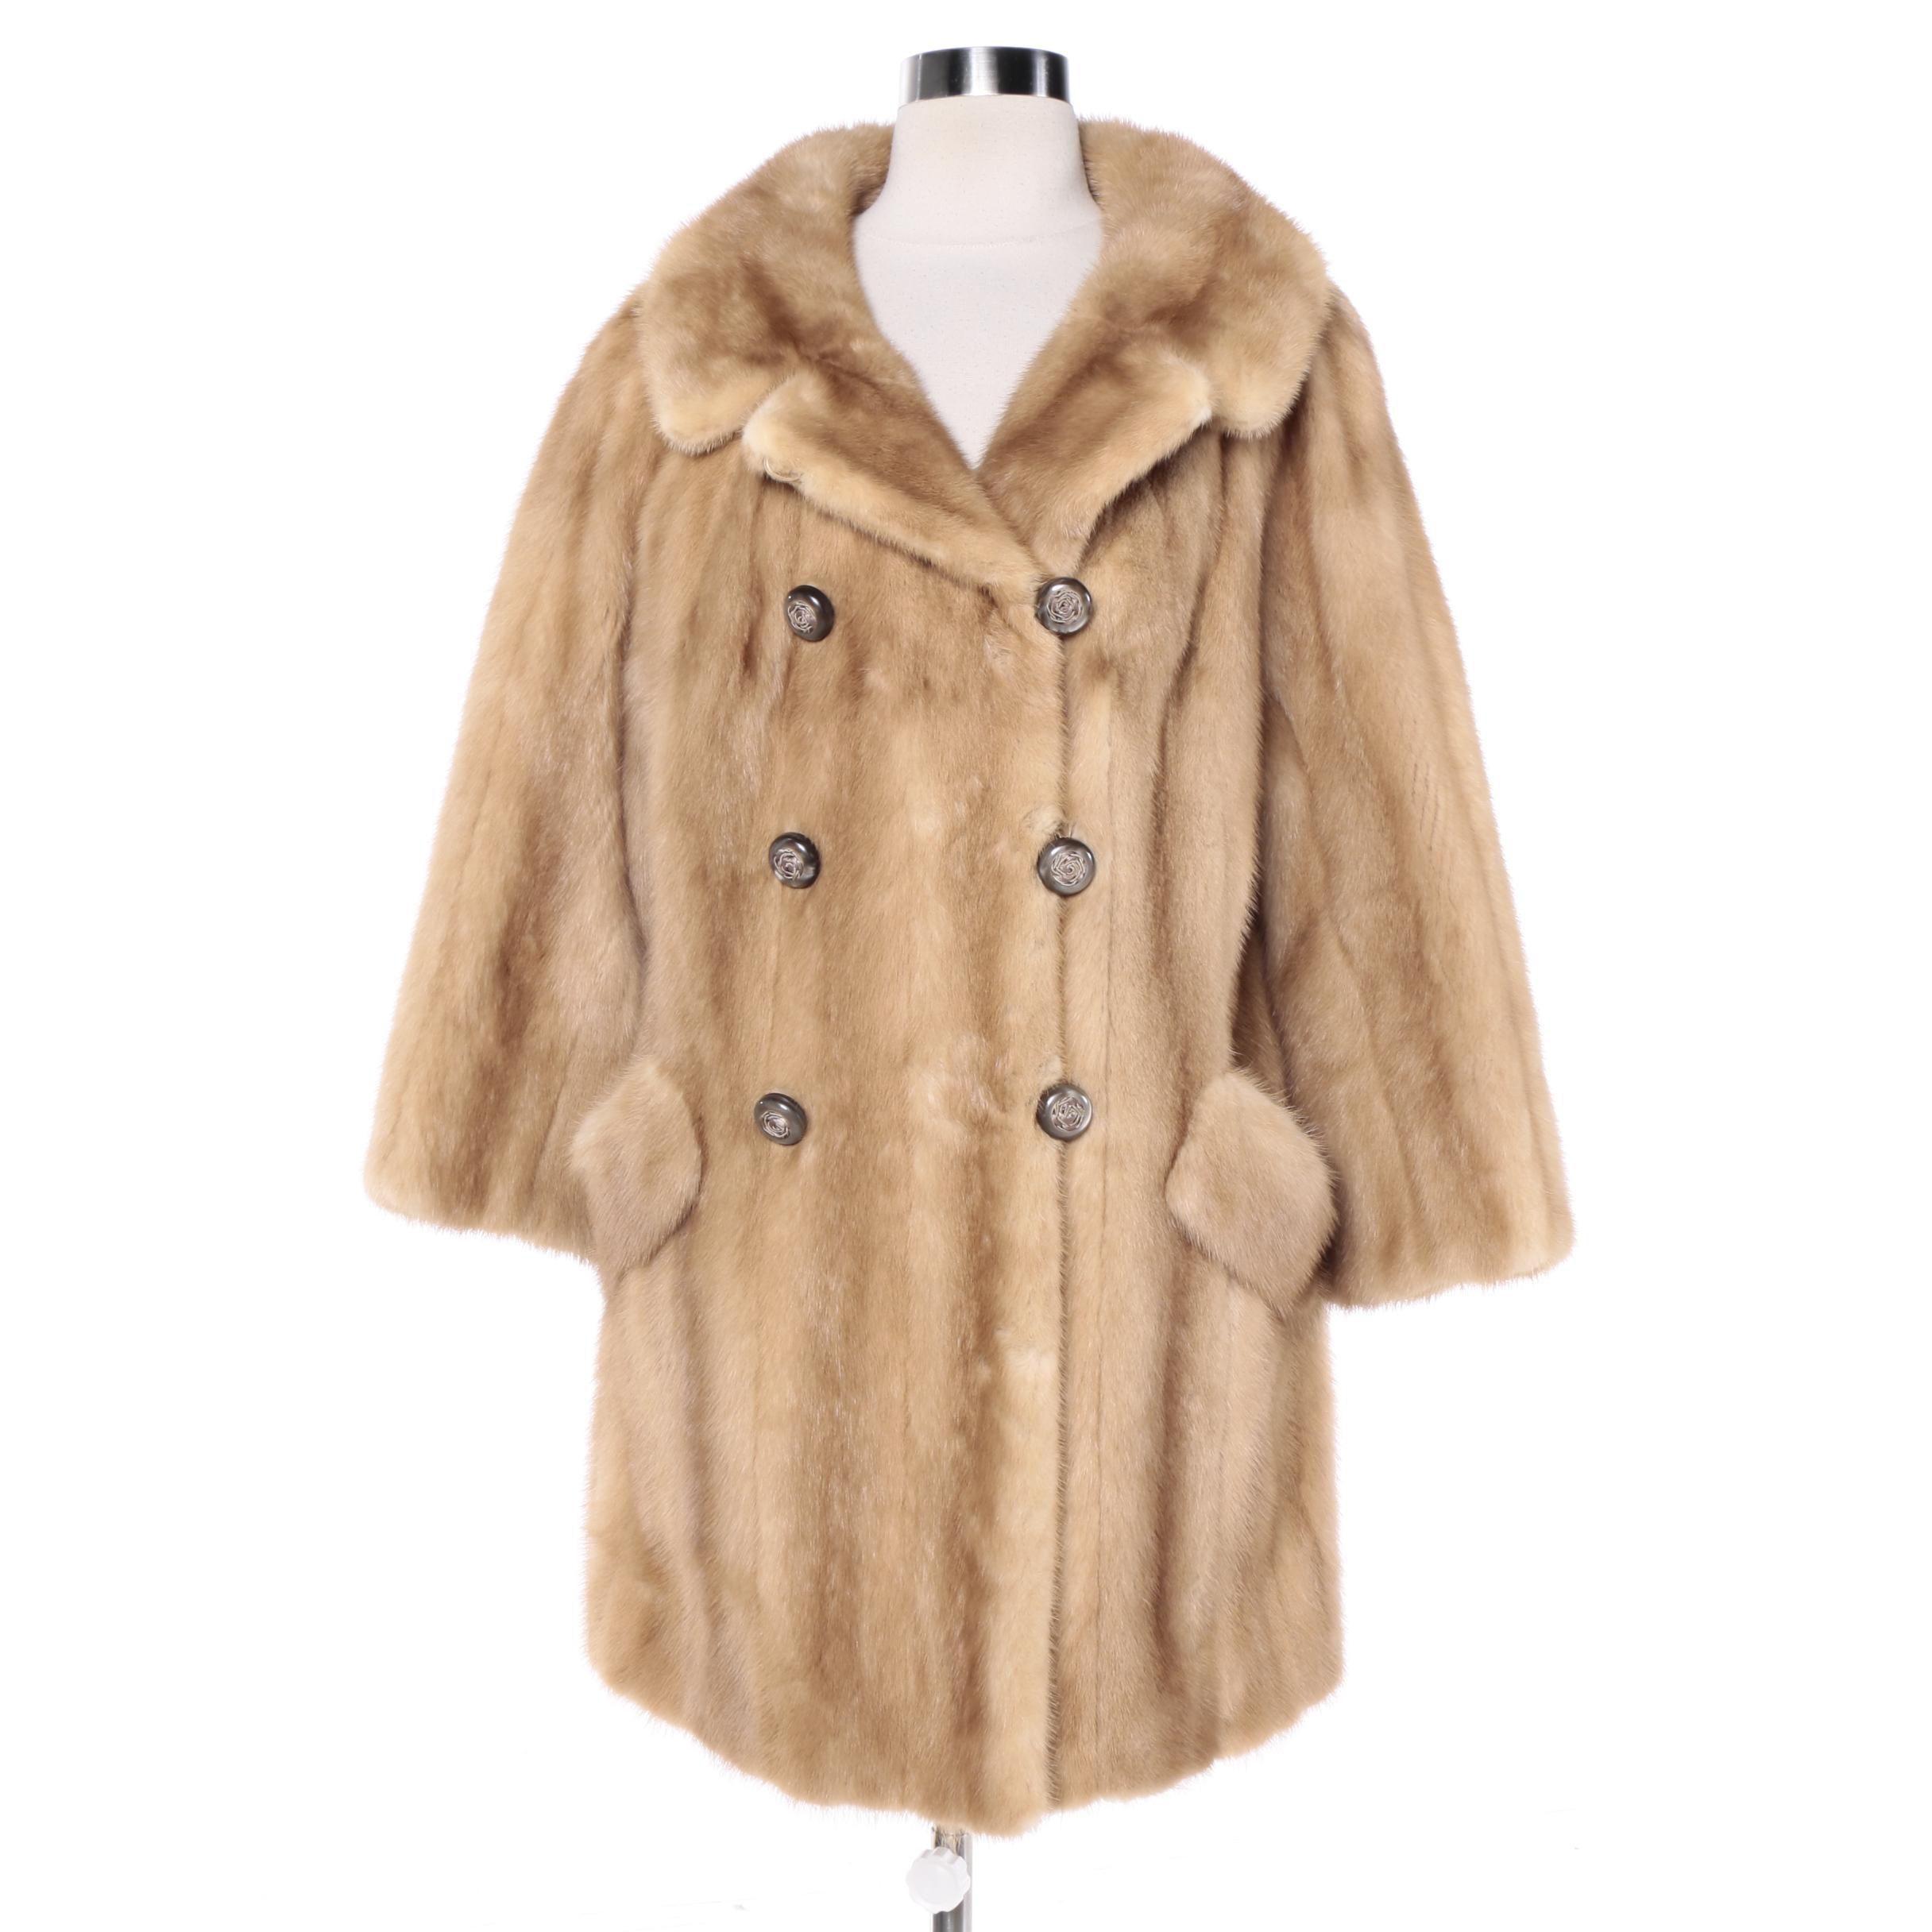 Vintage Double-Breasted Light Brown Mink Fur Coat